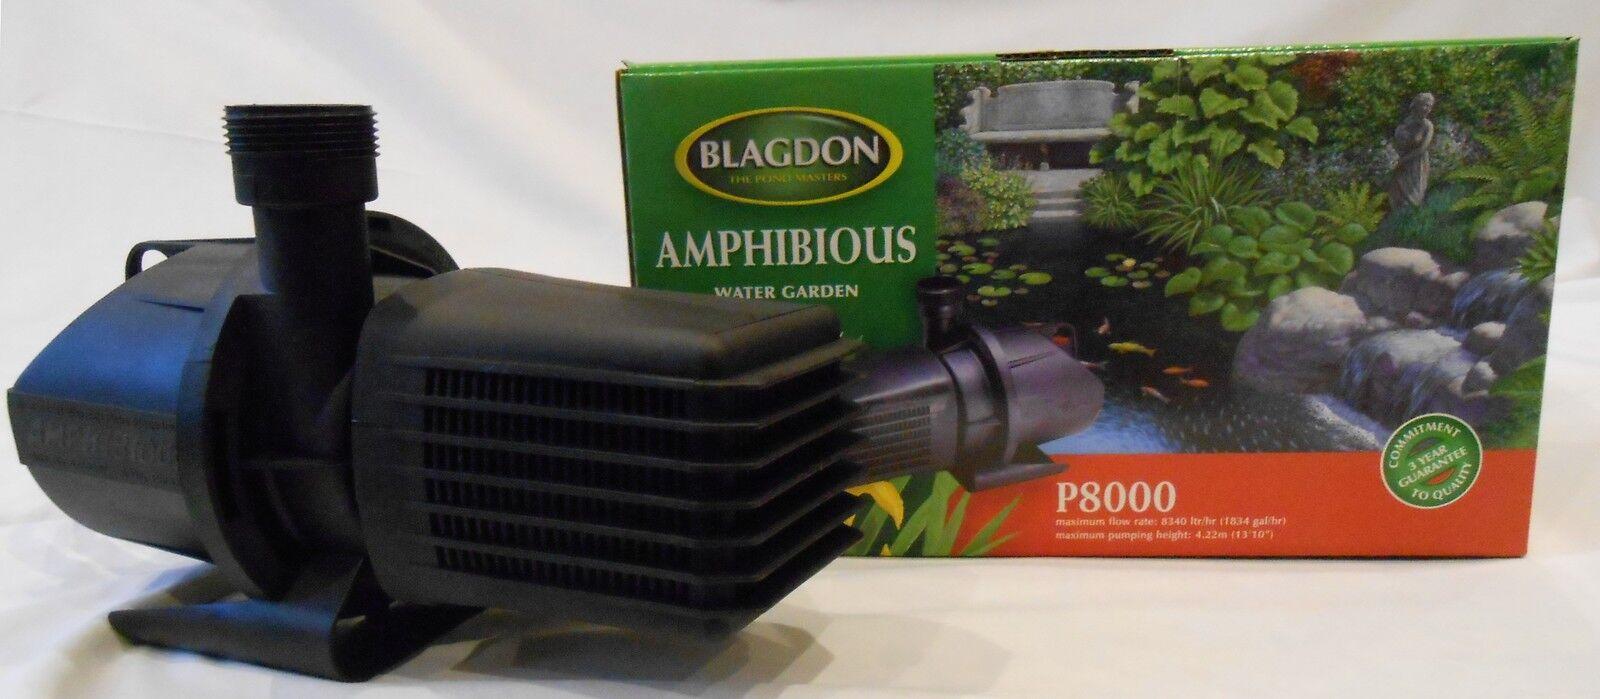 Sale Price Blagdon Amphibious Pond Pump P8000 8340 Lt/Hr for Koi Pond 🐟🐟🐟